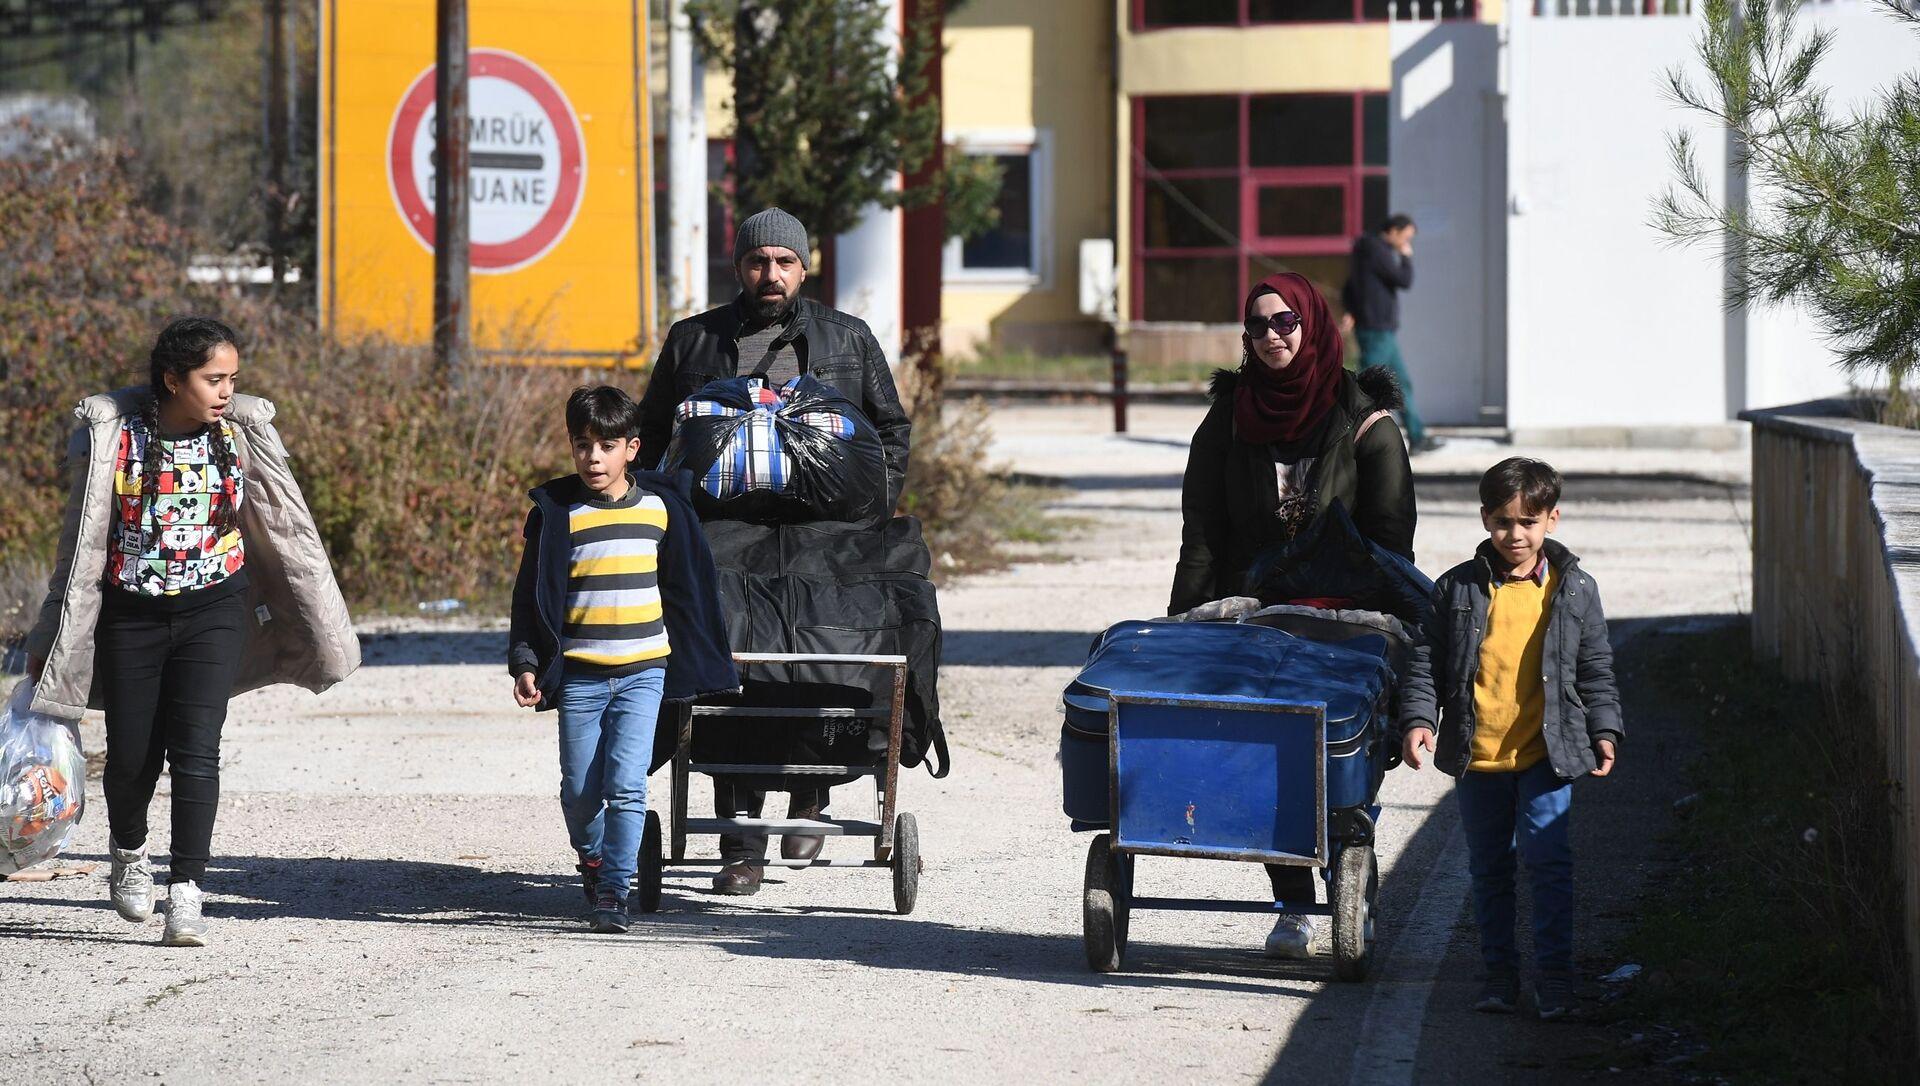 Rifugiati siriani al confine tra Siria e Turchia - Sputnik Italia, 1920, 27.04.2021